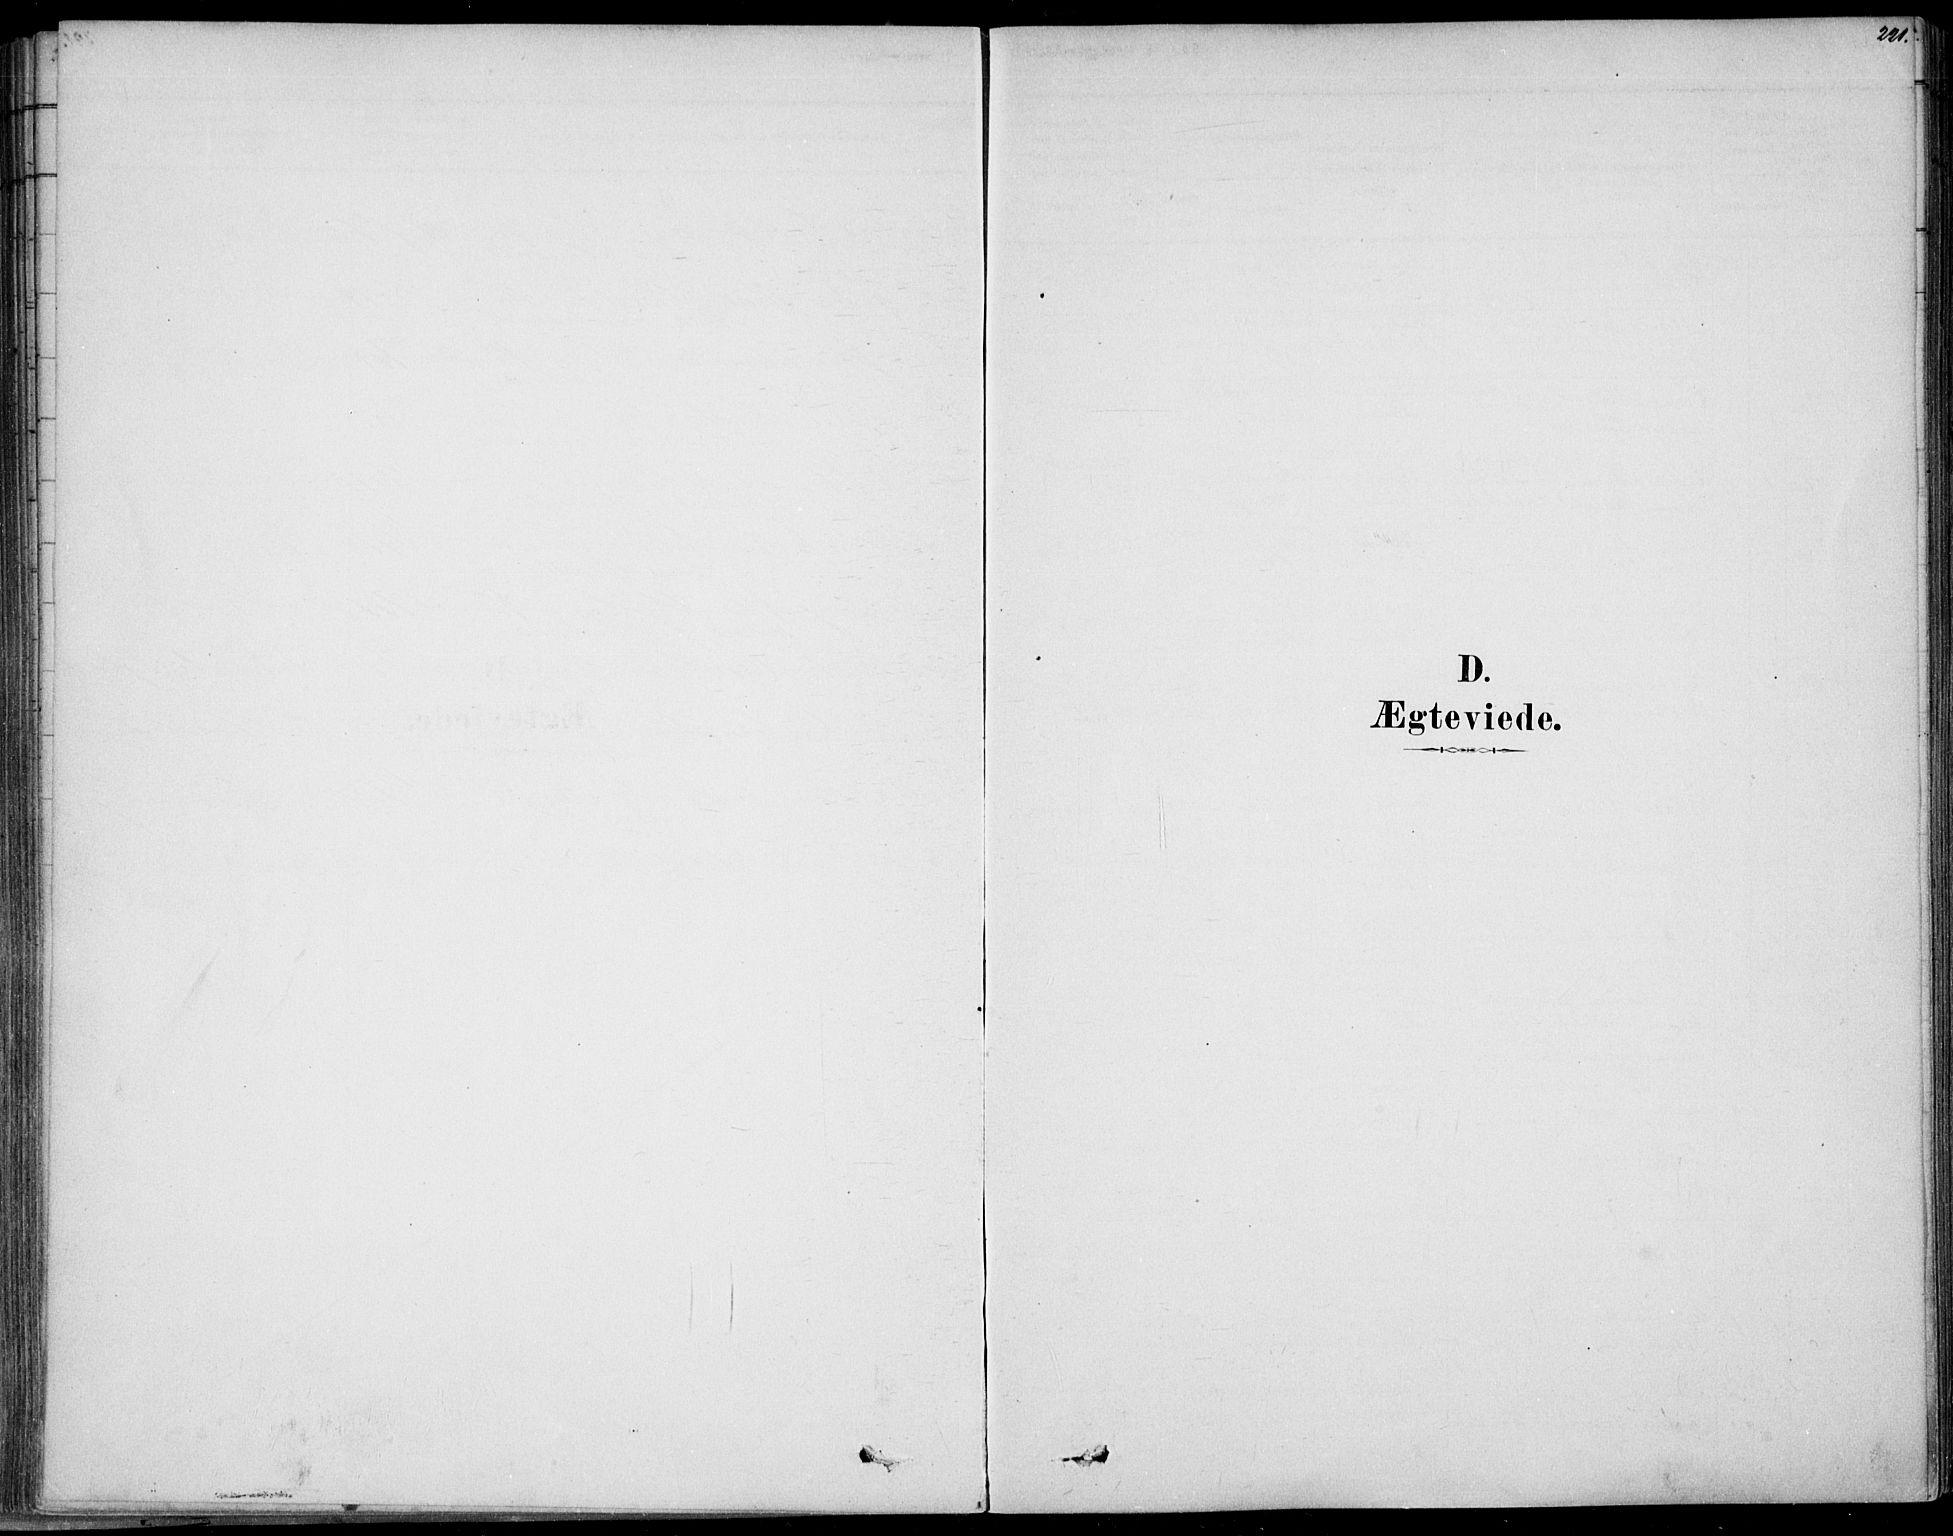 SAKO, Sem kirkebøker, F/Fb/L0004: Ministerialbok nr. II 4, 1878-1891, s. 221